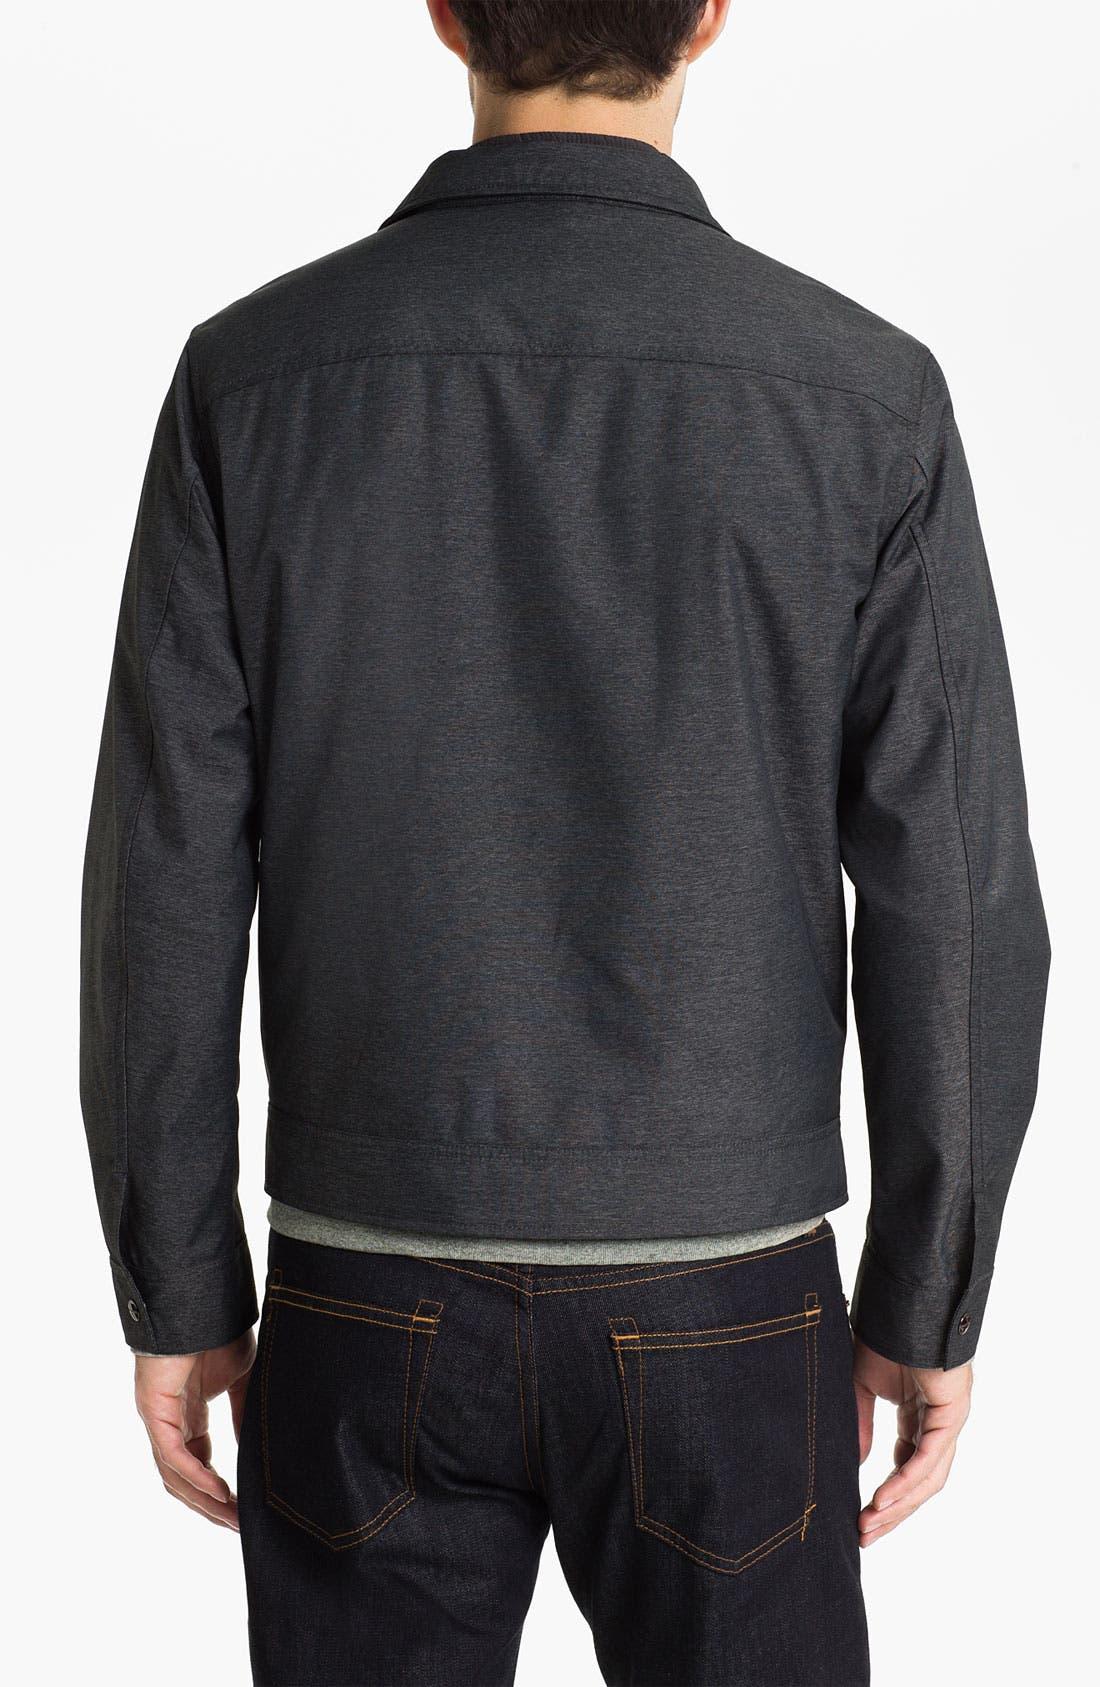 Alternate Image 2  - Michael Kors 3-in-1 Mélange Twill Jacket (Online Exclusive)